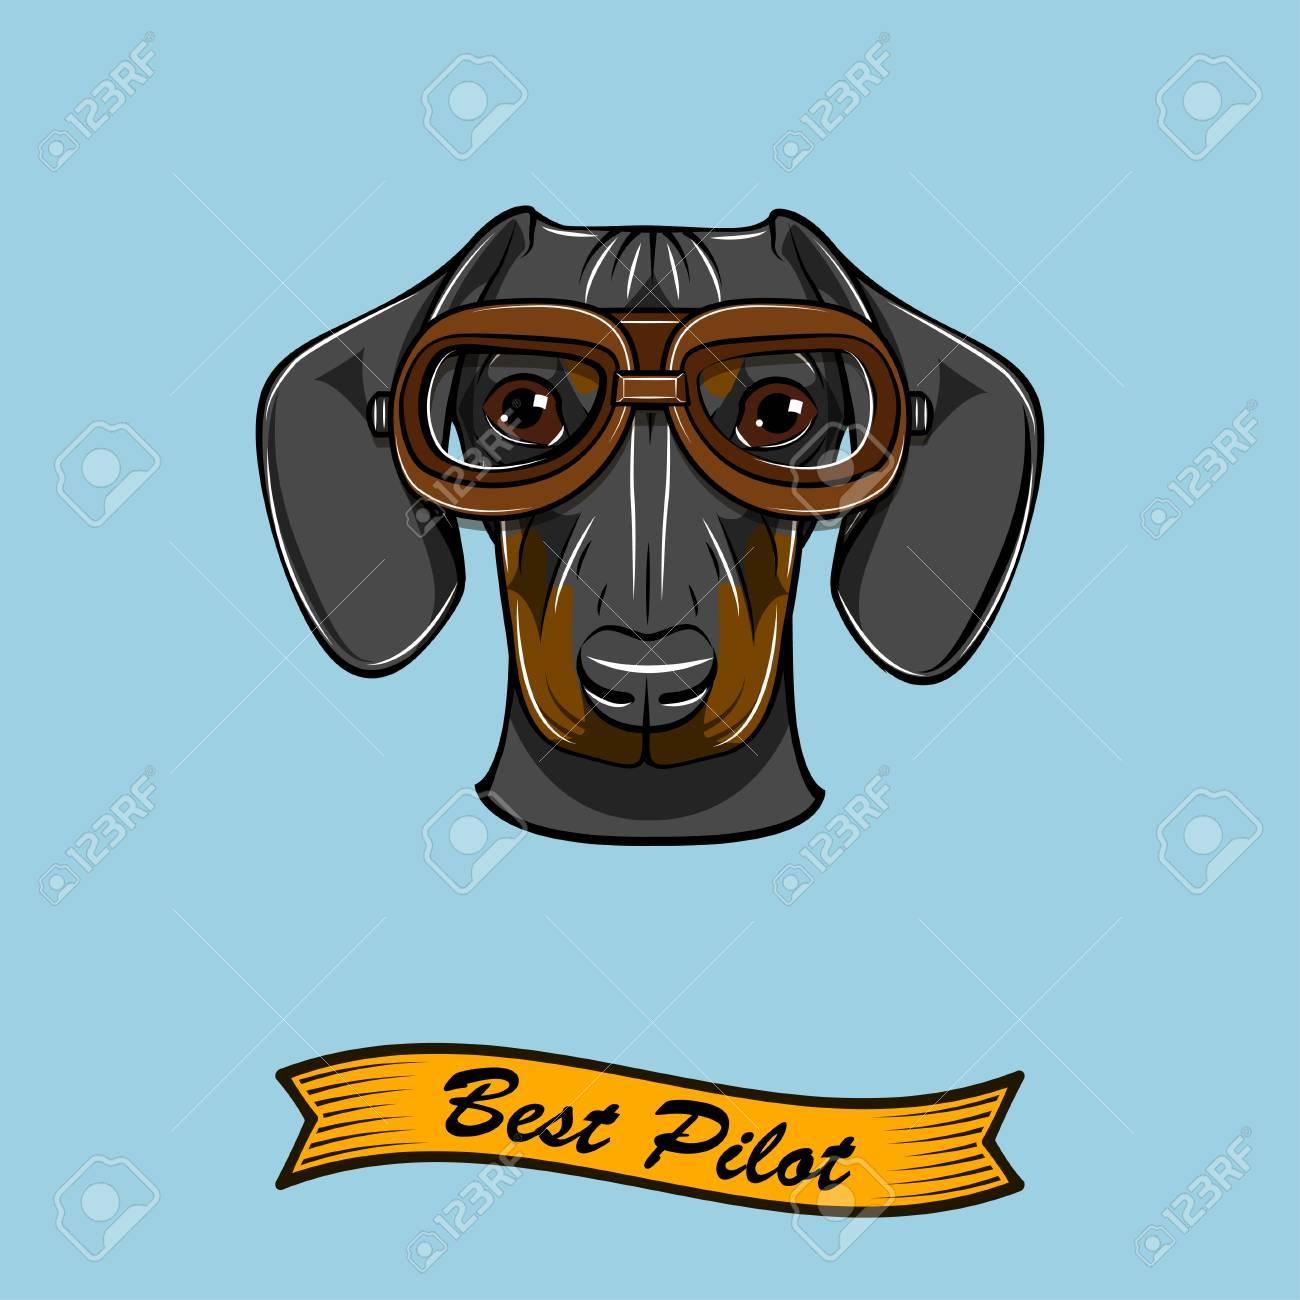 5d60843f95 Dachshund dog pilot with Aviators glasses Best pilot inscription Vector  illustration Stock Vector - 100905770